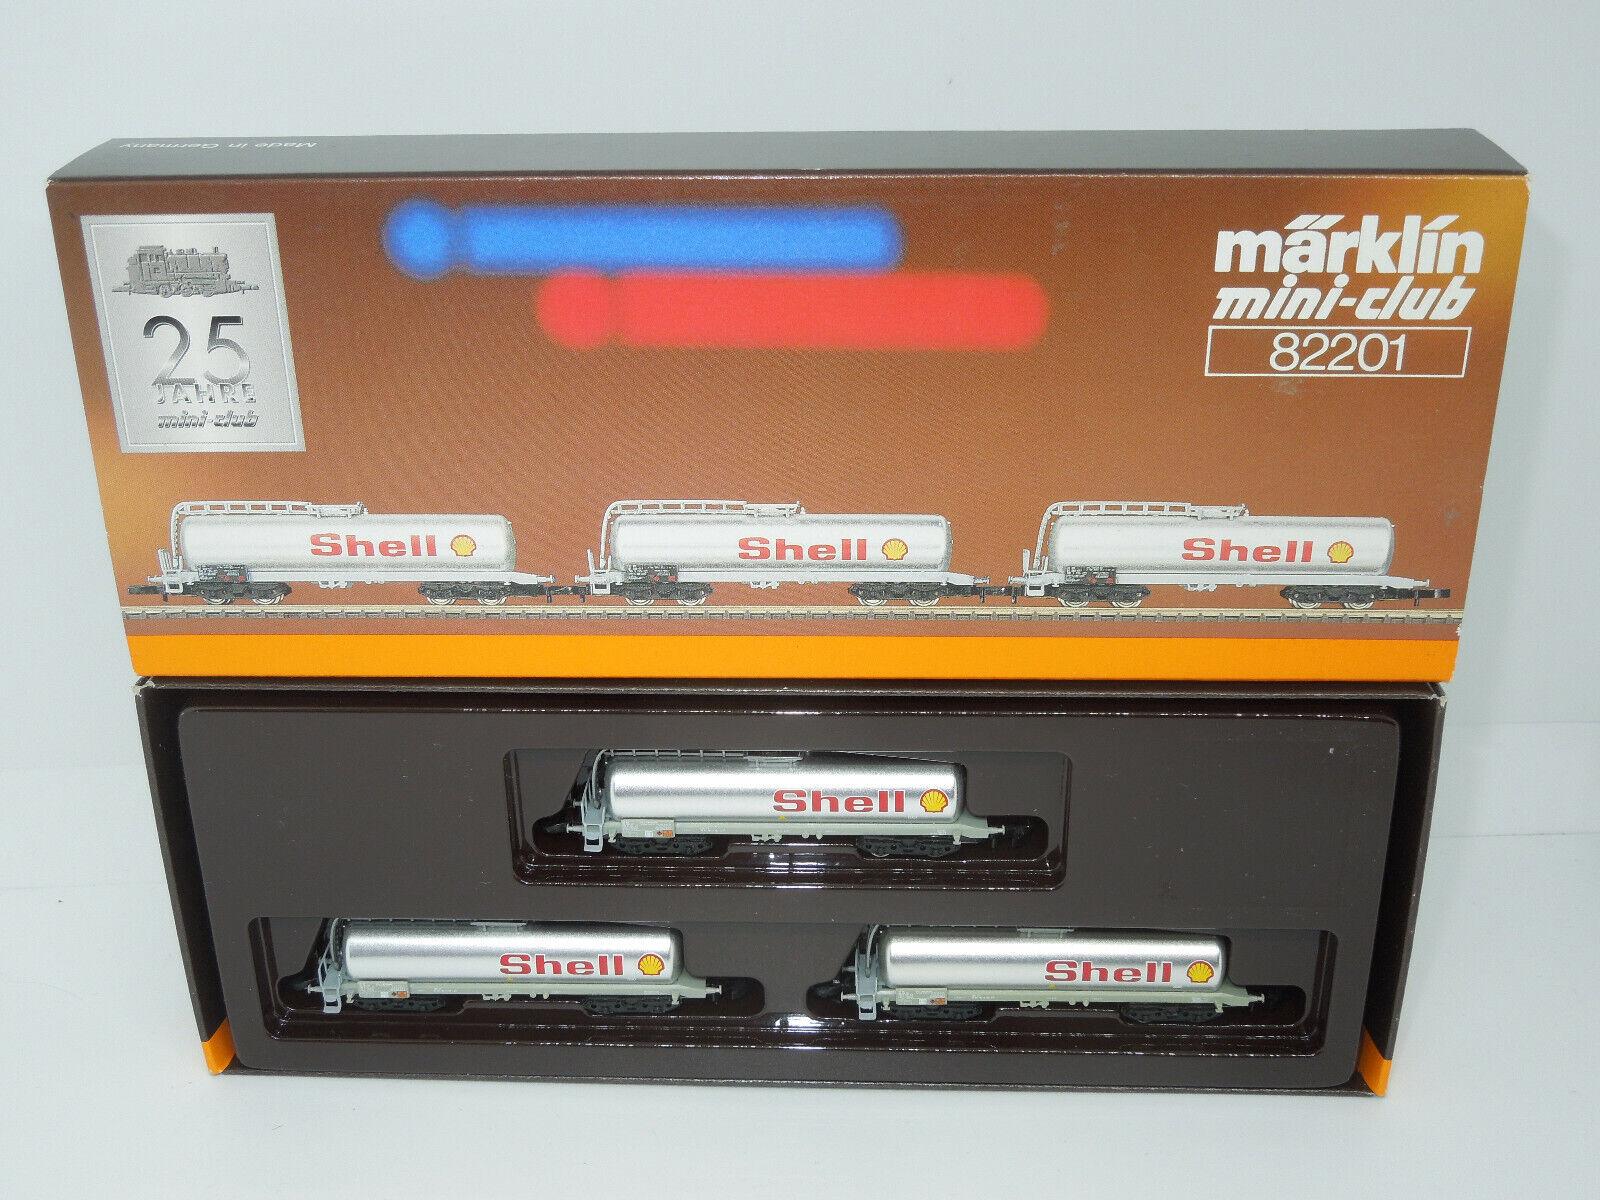 Dettagli su Märklin mini-club 82201 SBB provetto Wagenset Shell - 3 pezzi (2)